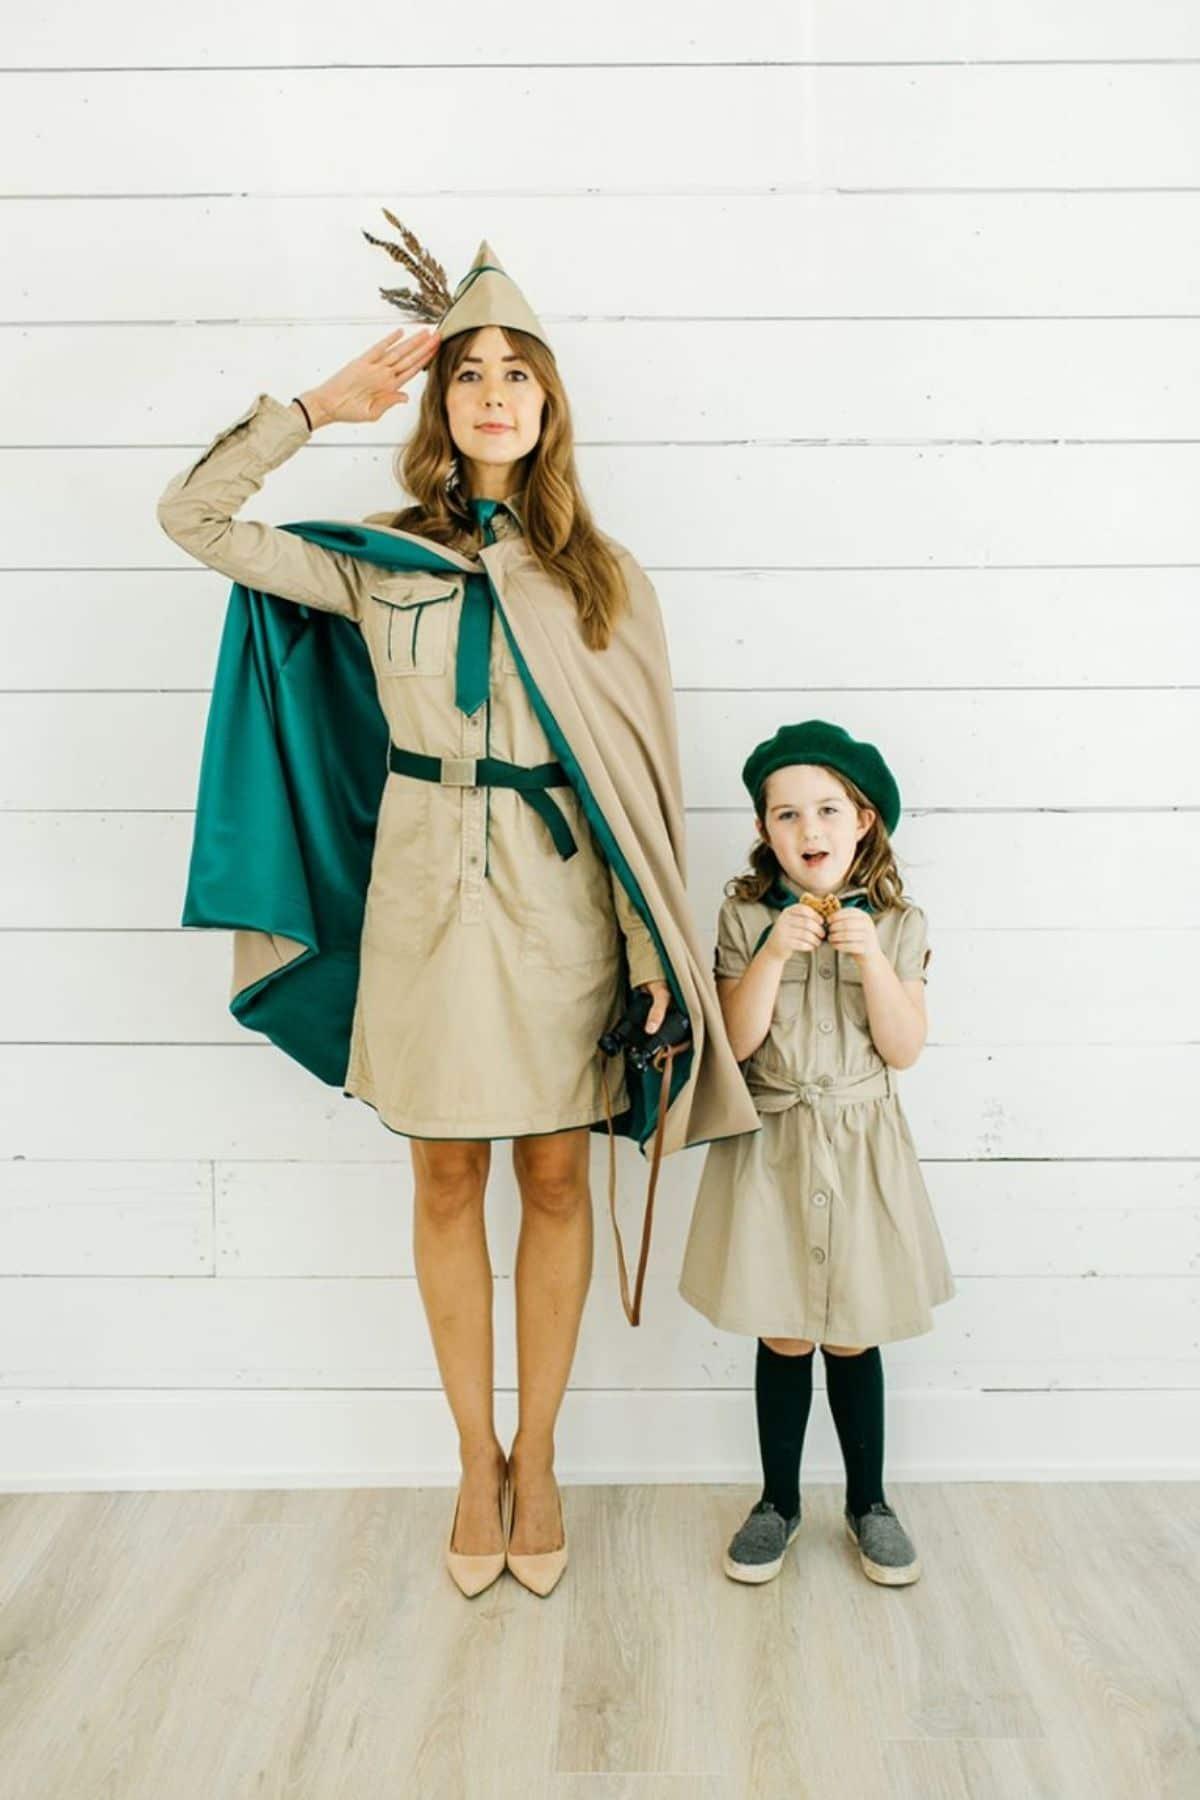 Troop Beverly Hills costumes